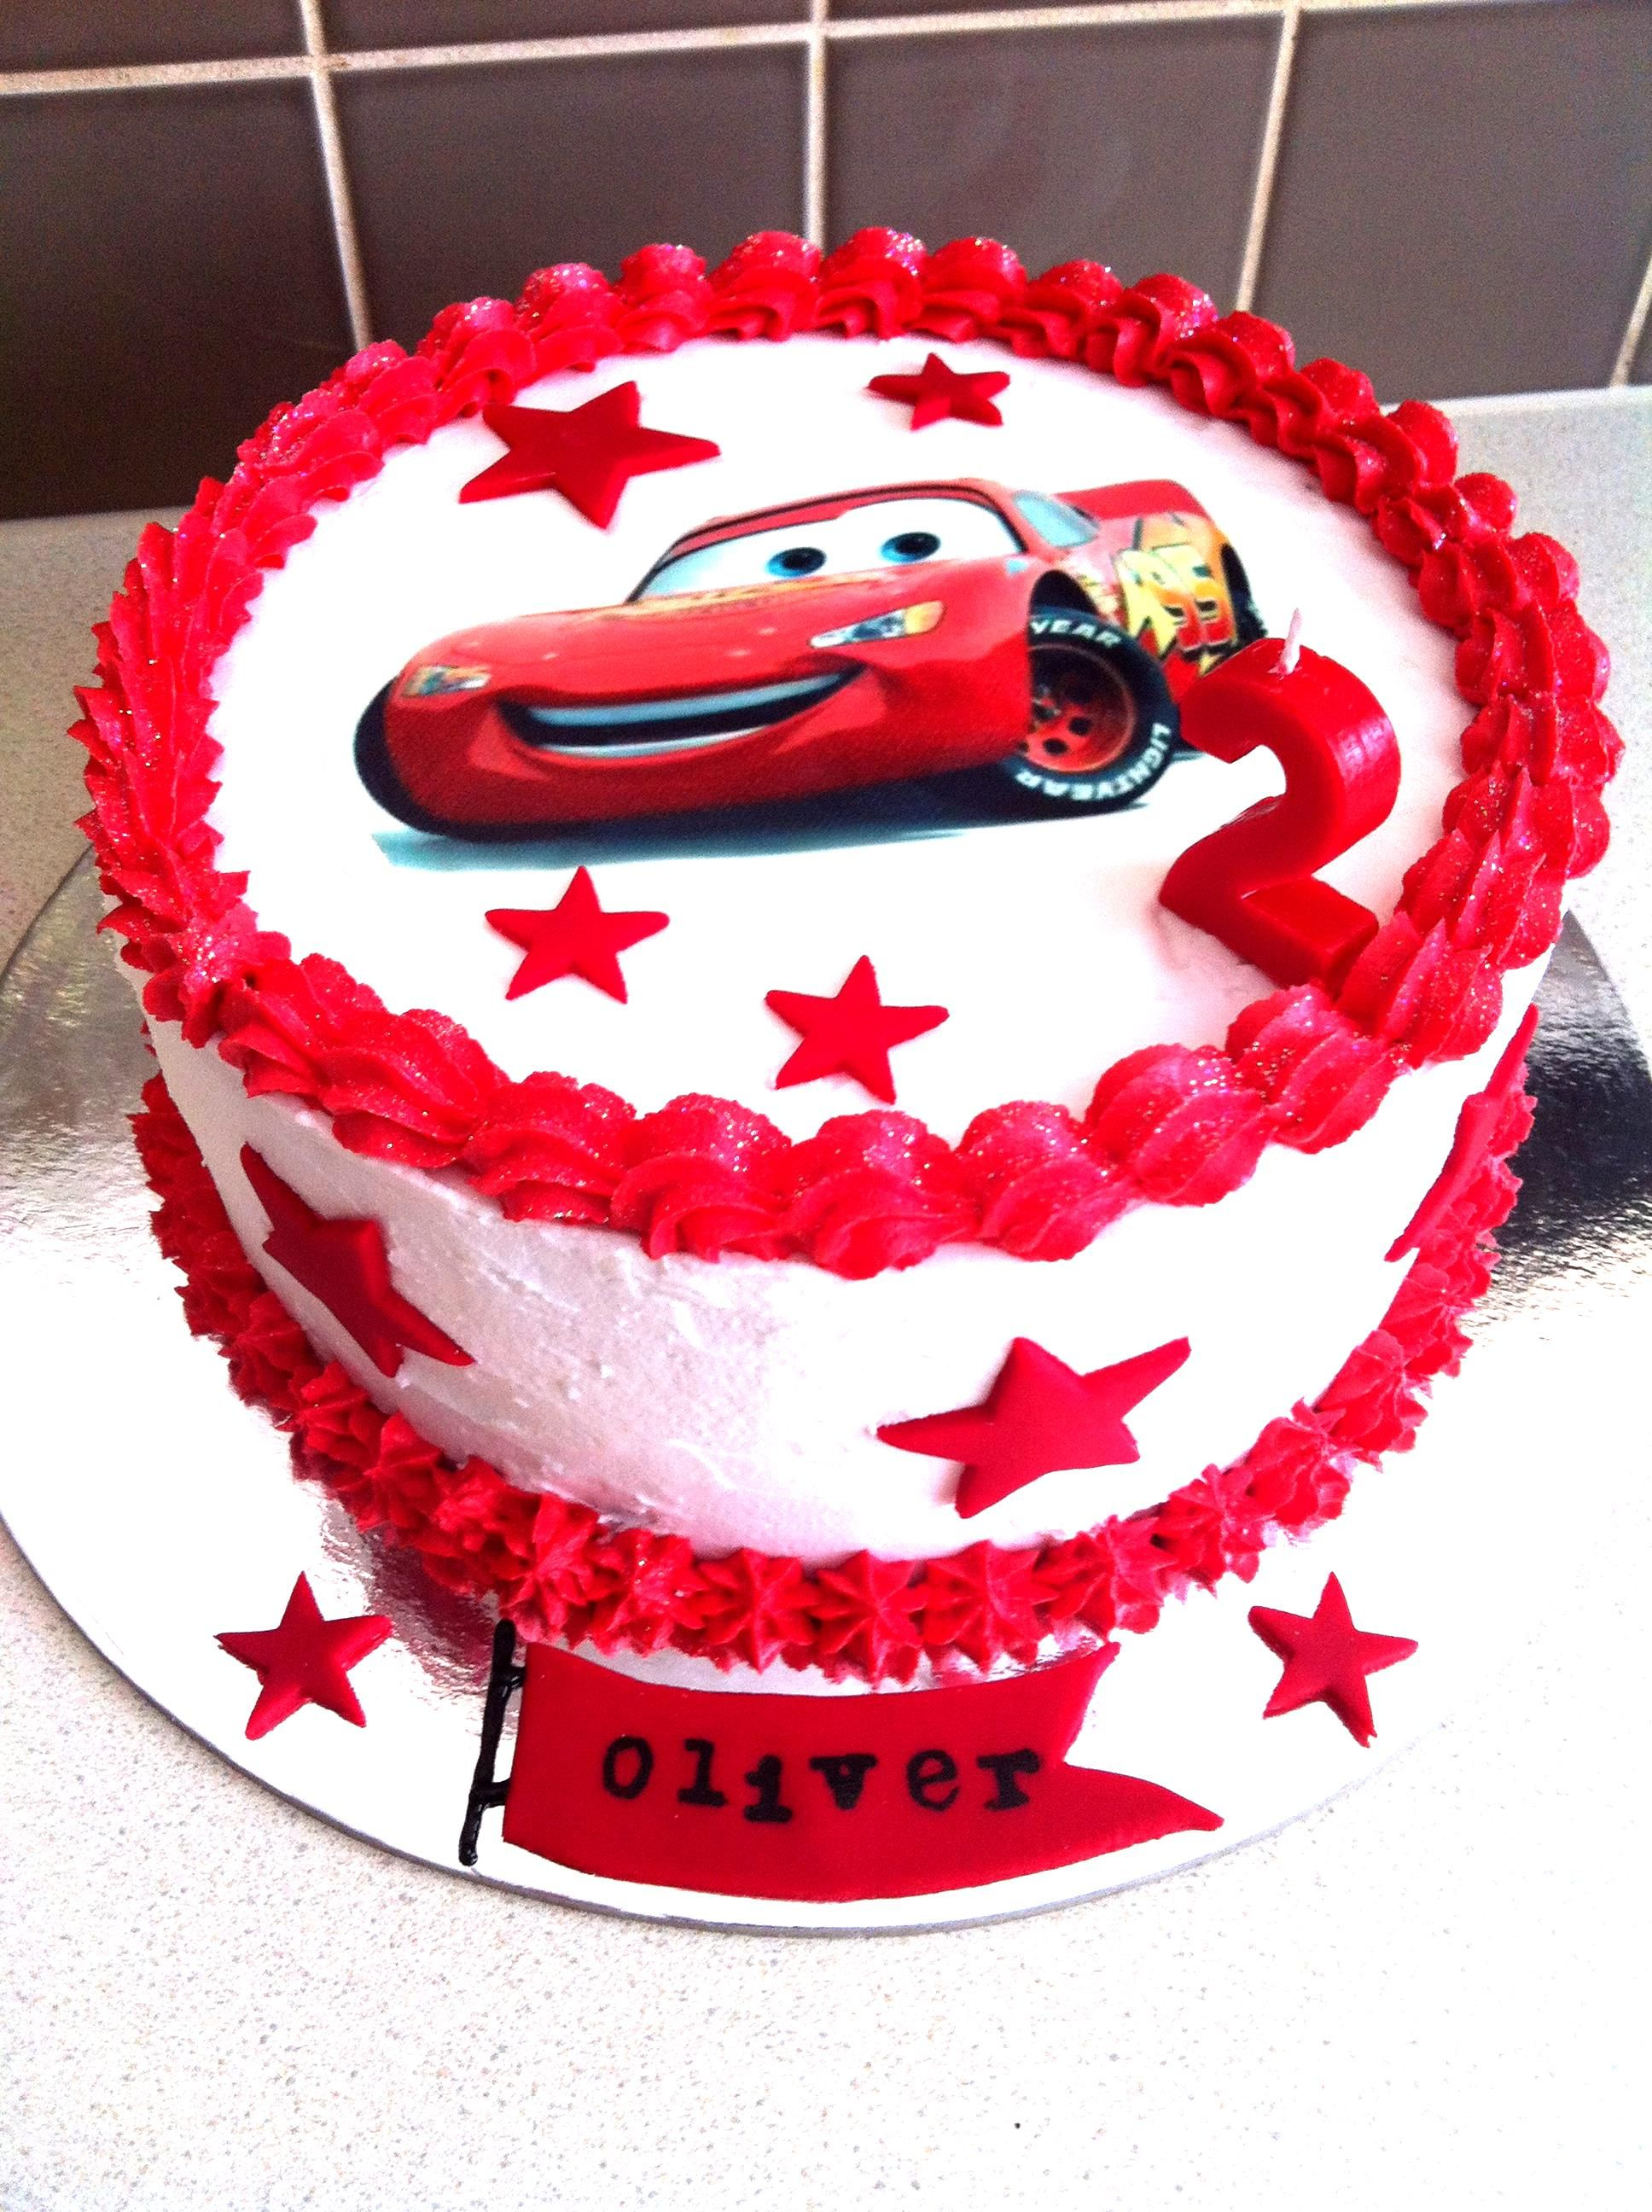 Lightning Mcqueen Birthday Cake Designs : Lightning McQueen birthday cake Mrs B cakes Pinterest ...